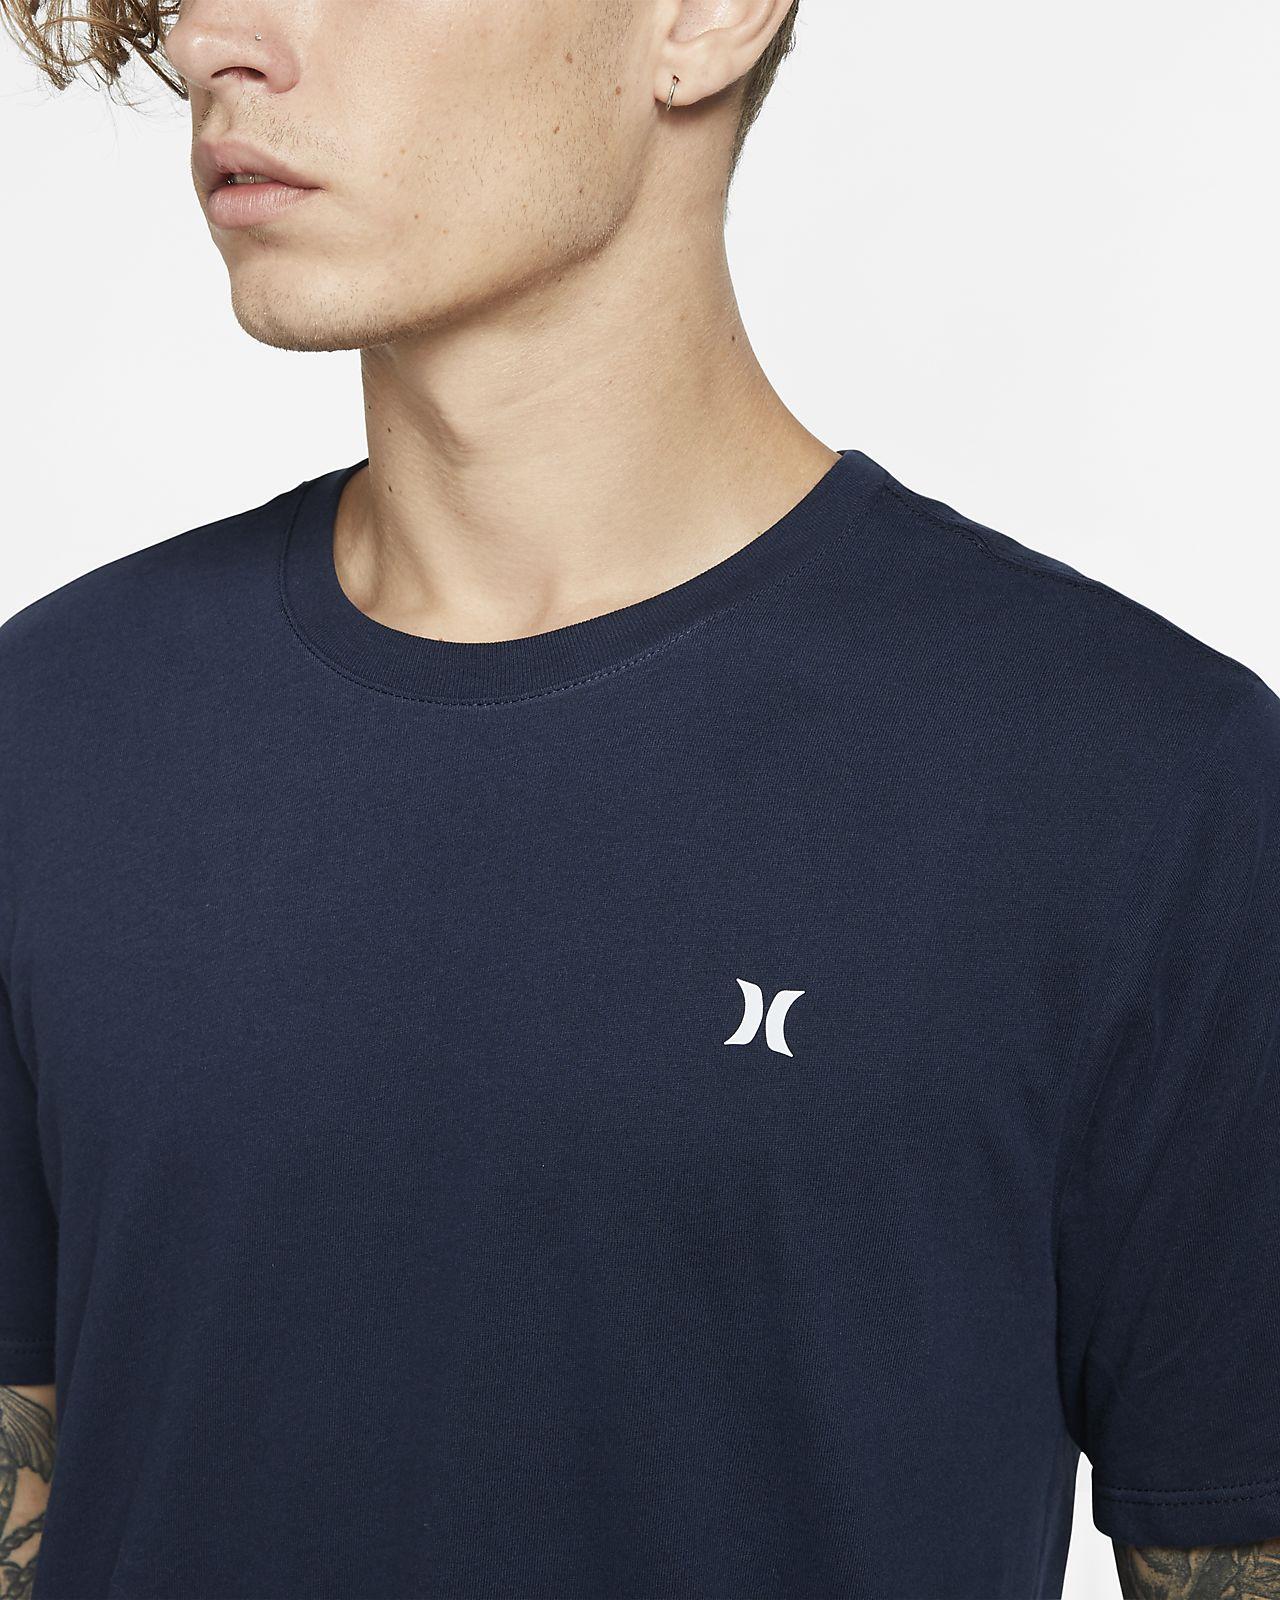 34c1dd8963 Hurley Dri-FIT Icon Reflective Men's Premium Fit Short-Sleeve T-Shirt